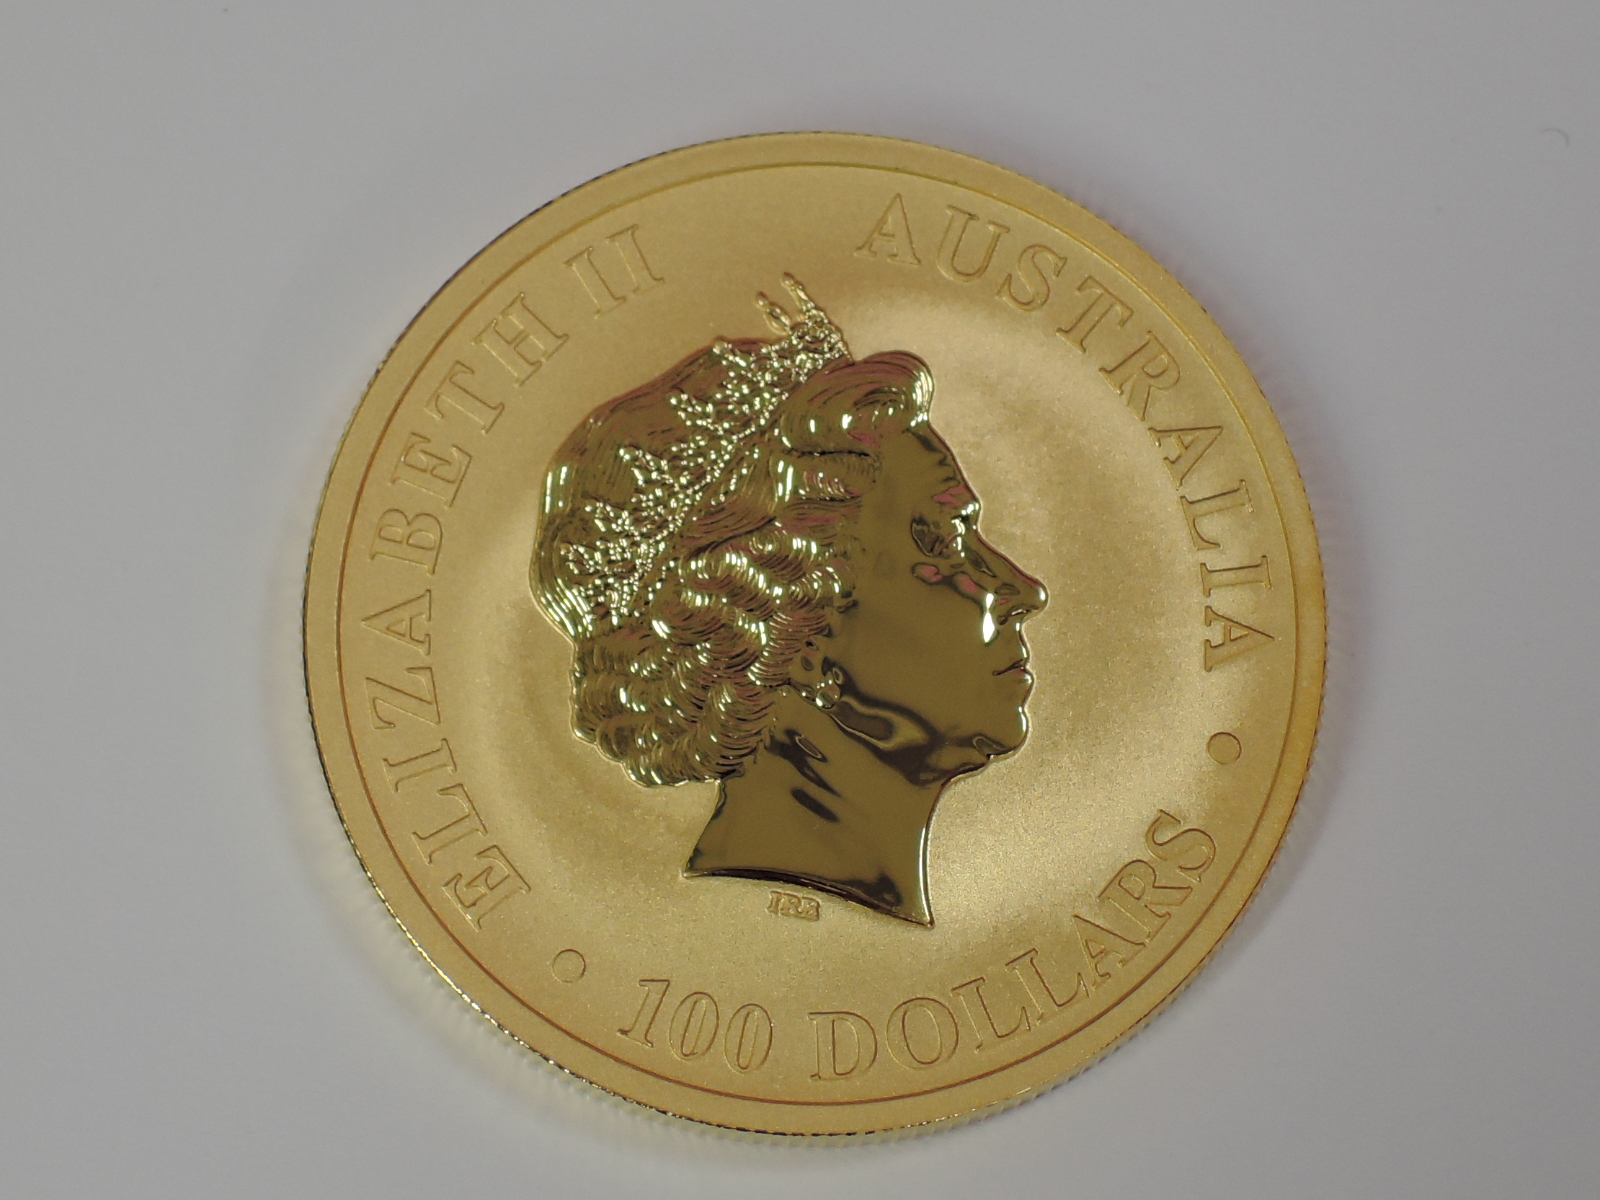 Lot 610 - A gold 1oz 2017 100 dollar Australian Kangaroo coin, in plastic case